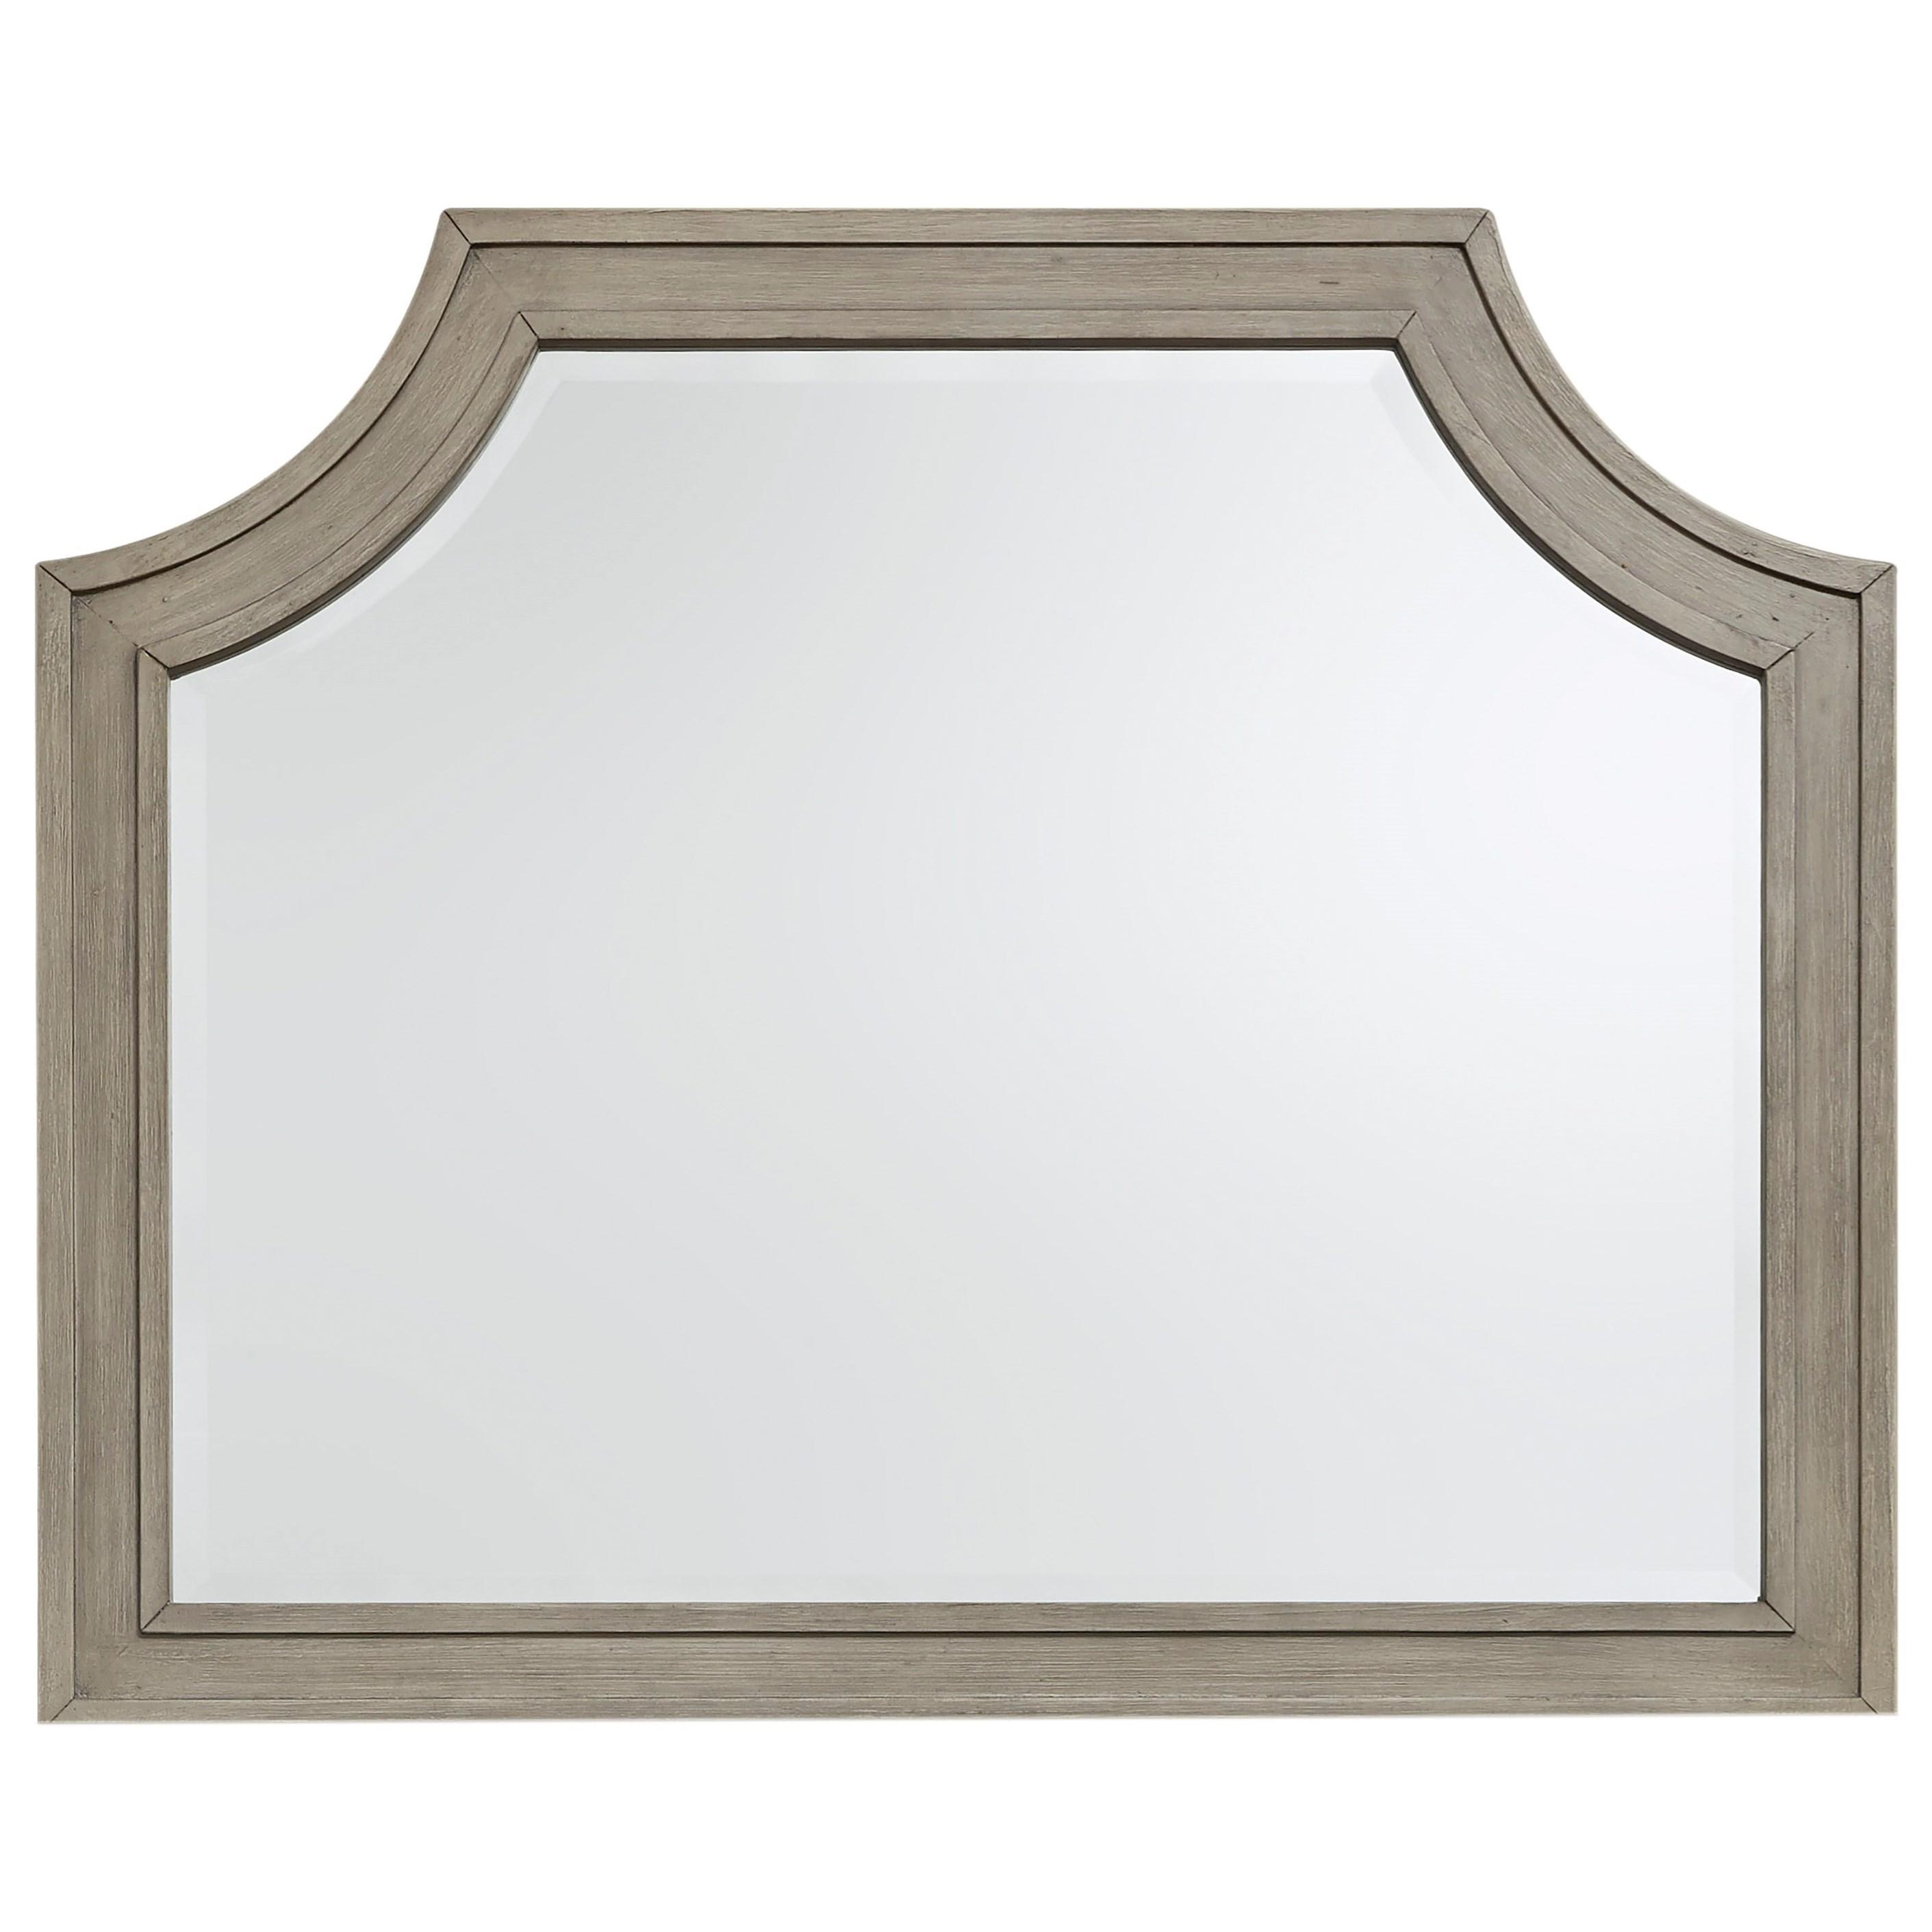 Falkhurst Bedroom Mirror by Benchcraft at Value City Furniture